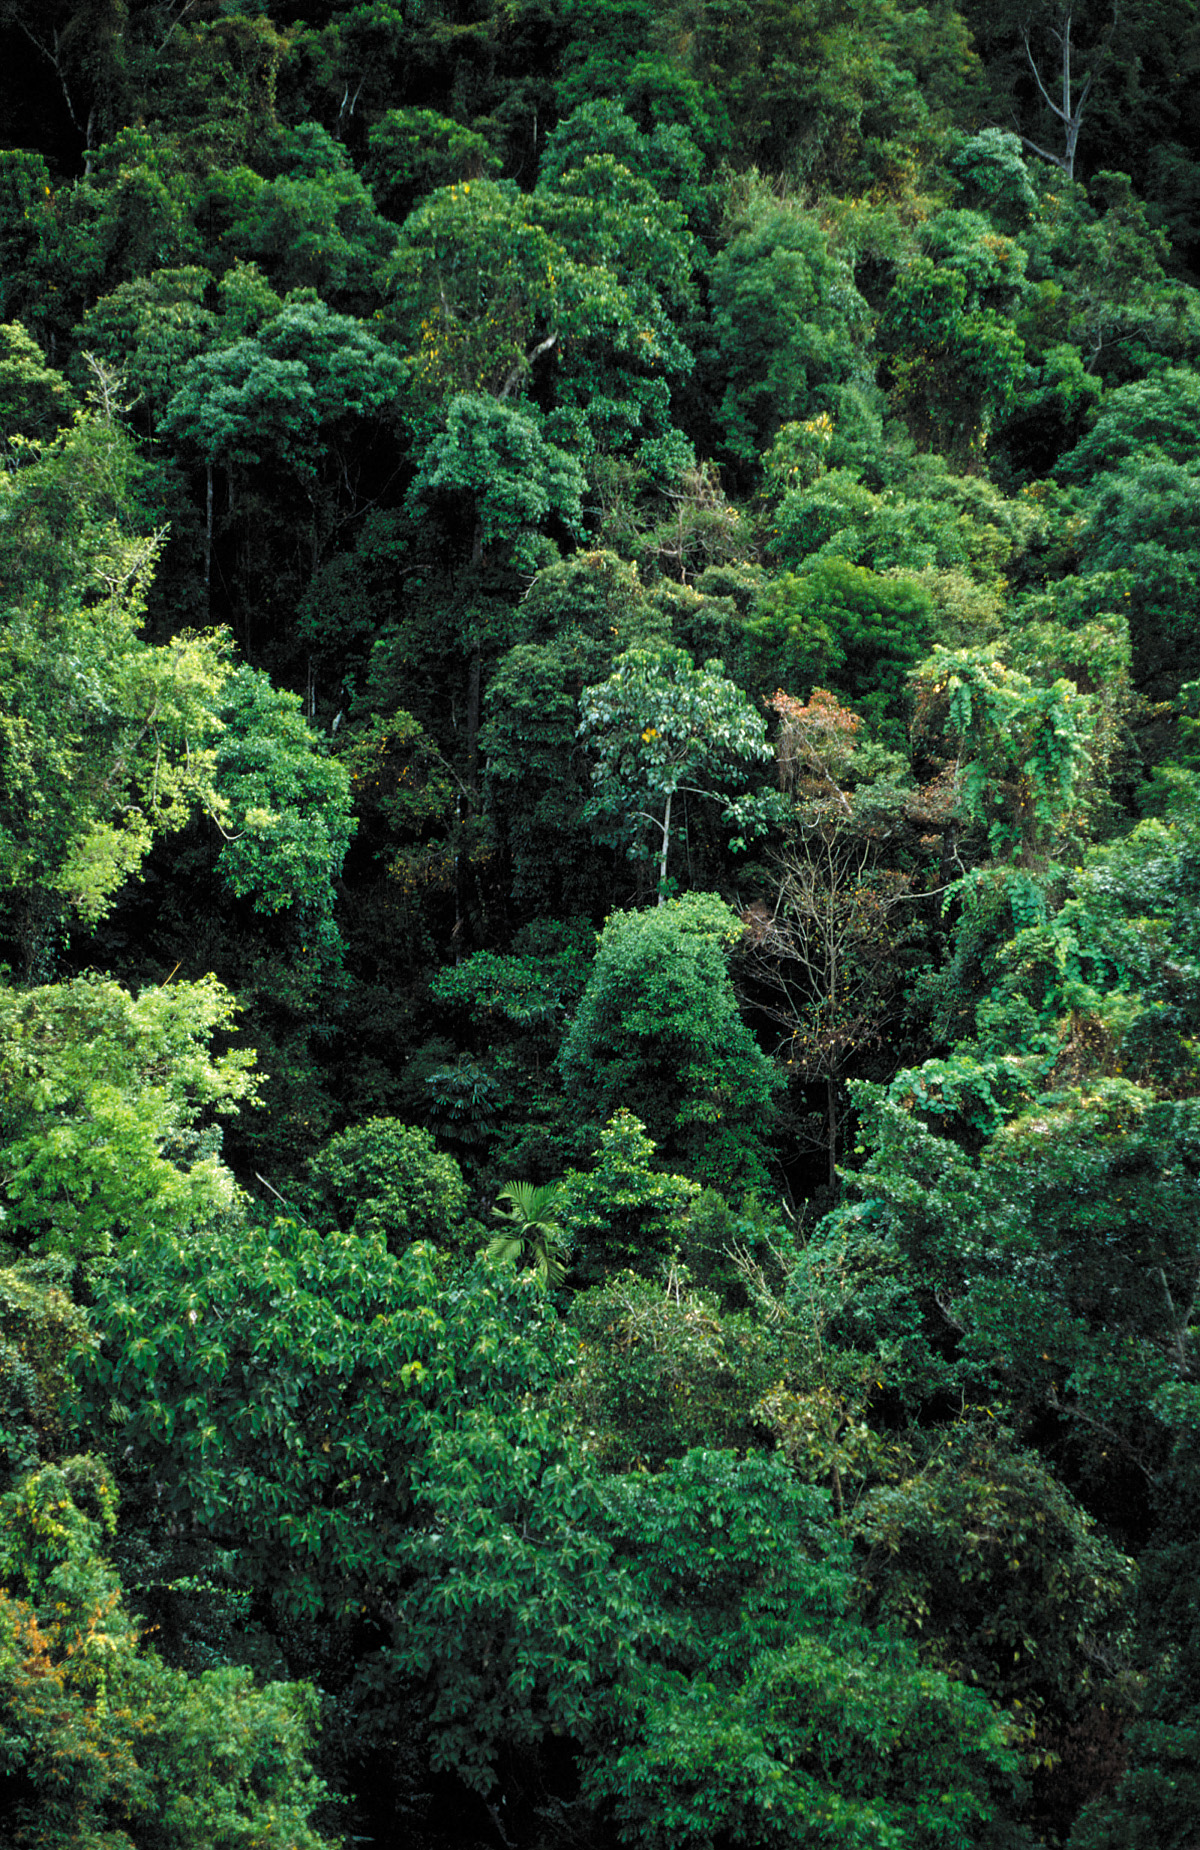 FileCSIRO ScienceImage 3827 Tropical rainforest canopy near Cairns QLD.jpg & File:CSIRO ScienceImage 3827 Tropical rainforest canopy near ...